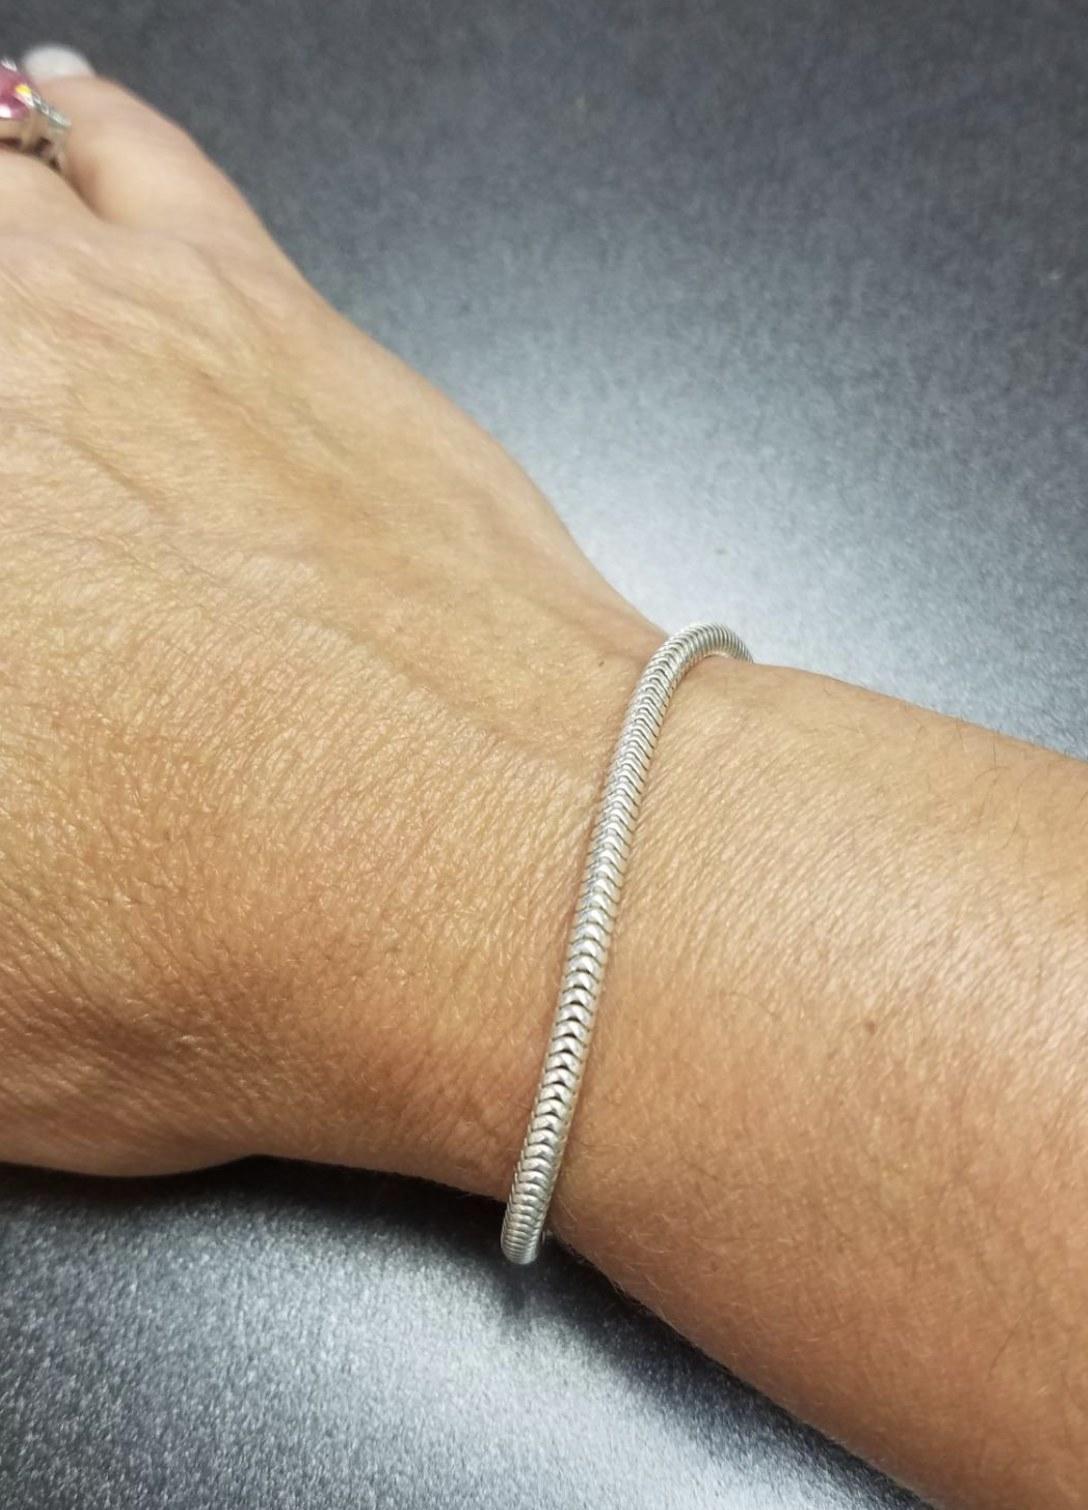 a silver bracelet on a person's wrist